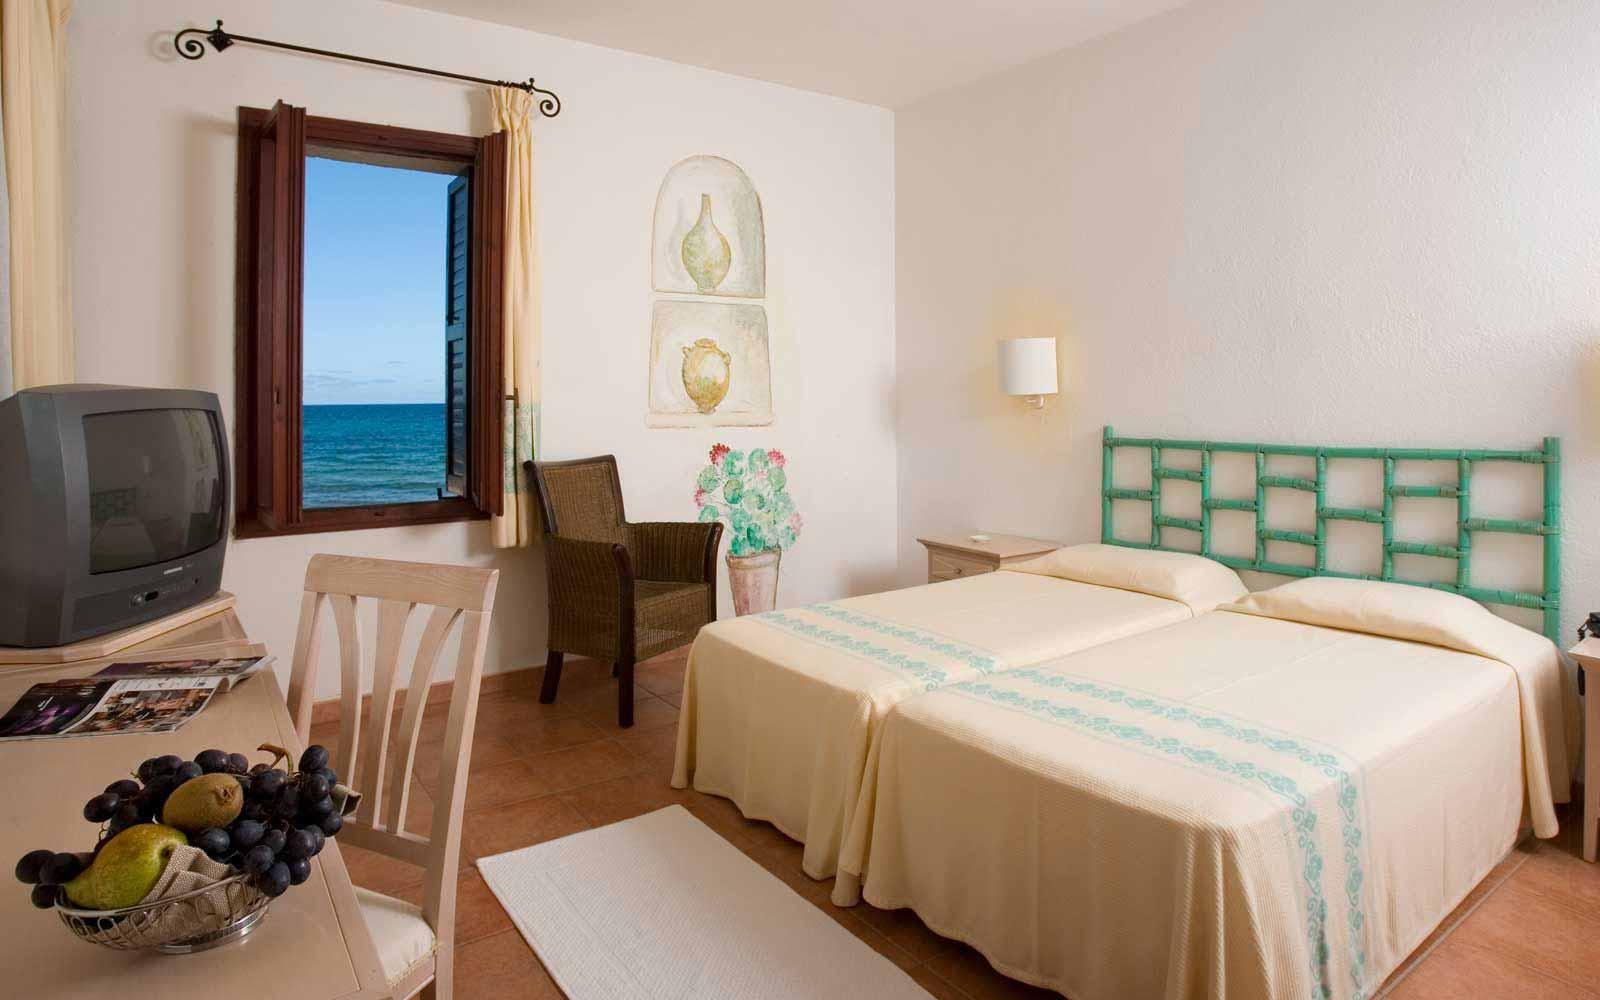 Standard room seaview at Hotel Flamingo